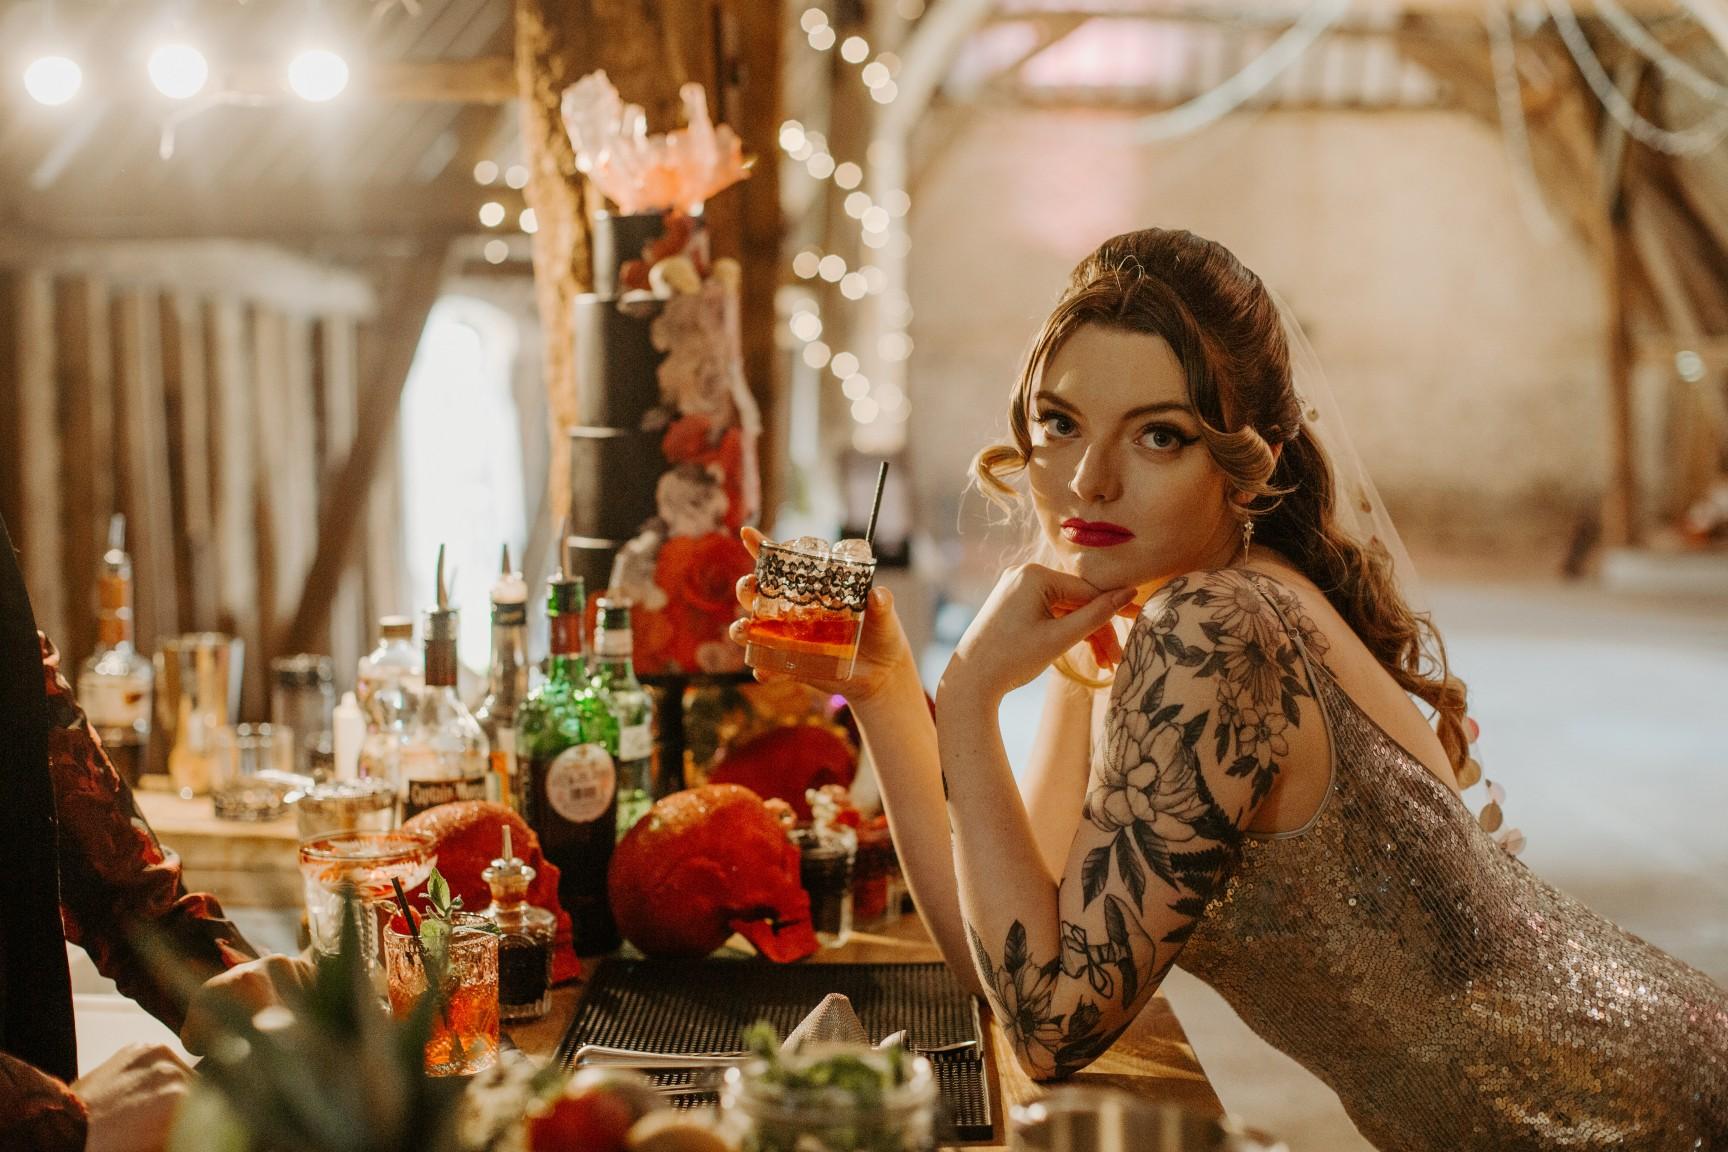 rock and roll wedding - edgy wedding inspiration - edgy bride - alternative bridal wear - unique wedding cocktail bar